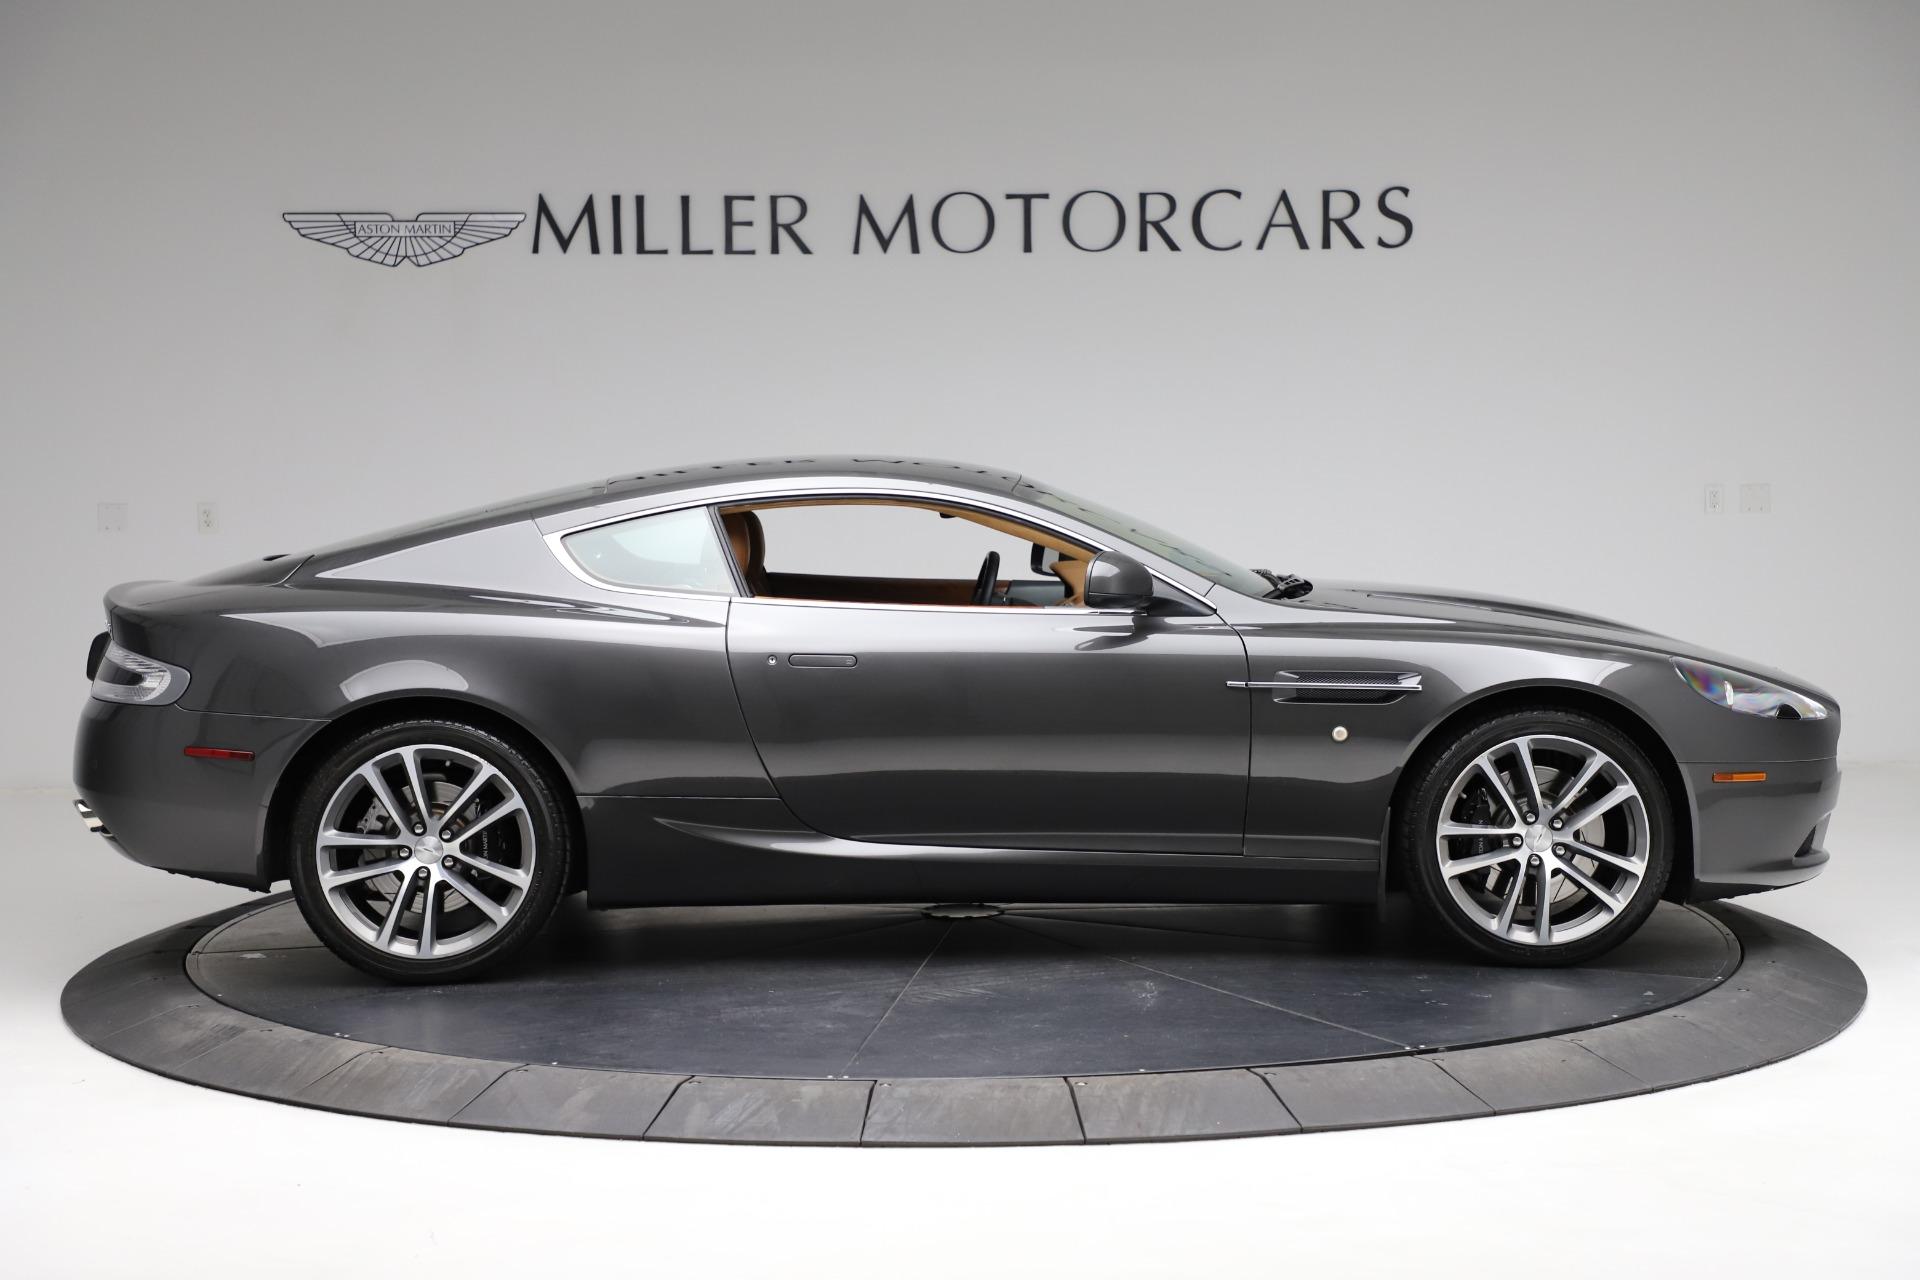 Pre Owned 2012 Aston Martin Db9 For Sale Miller Motorcars Stock 8058